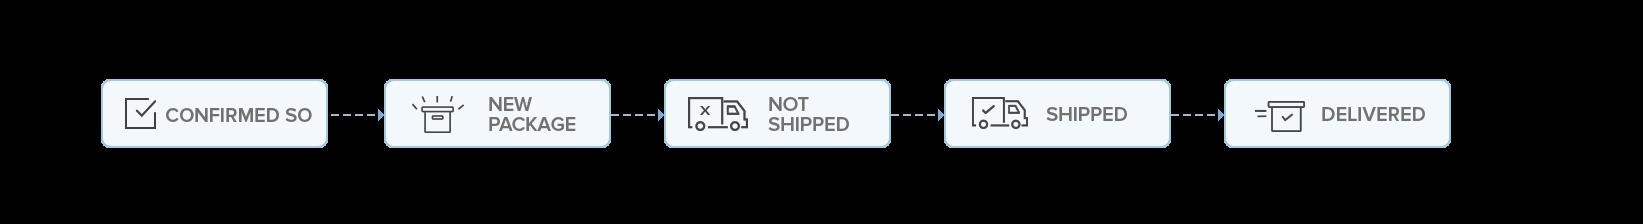 Package overflow image